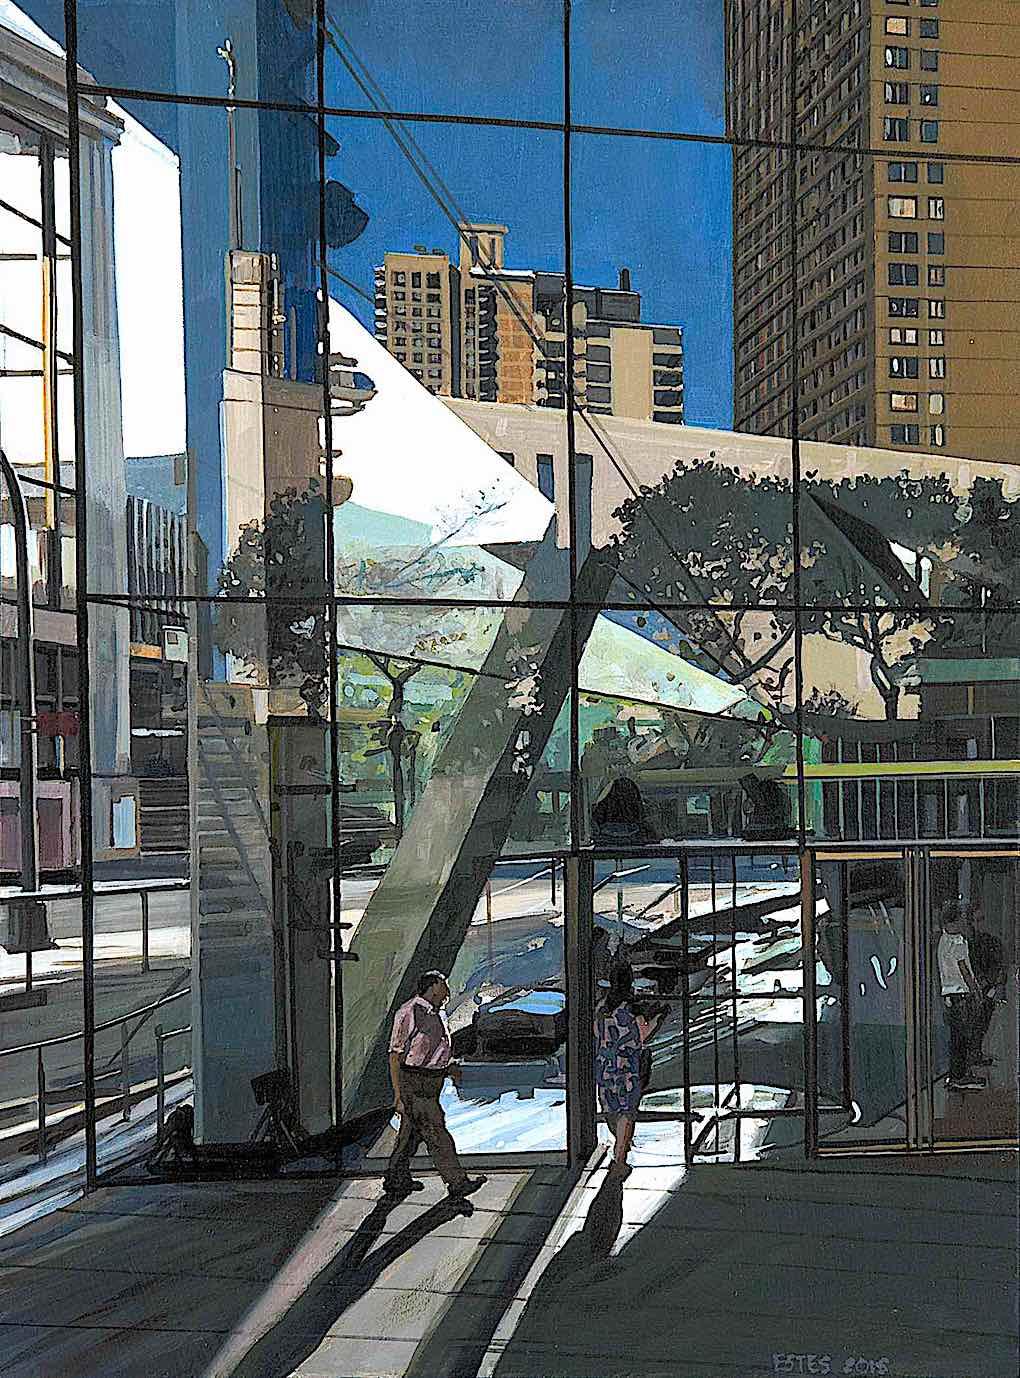 Richard Estes realism art, a painting of an urban scene